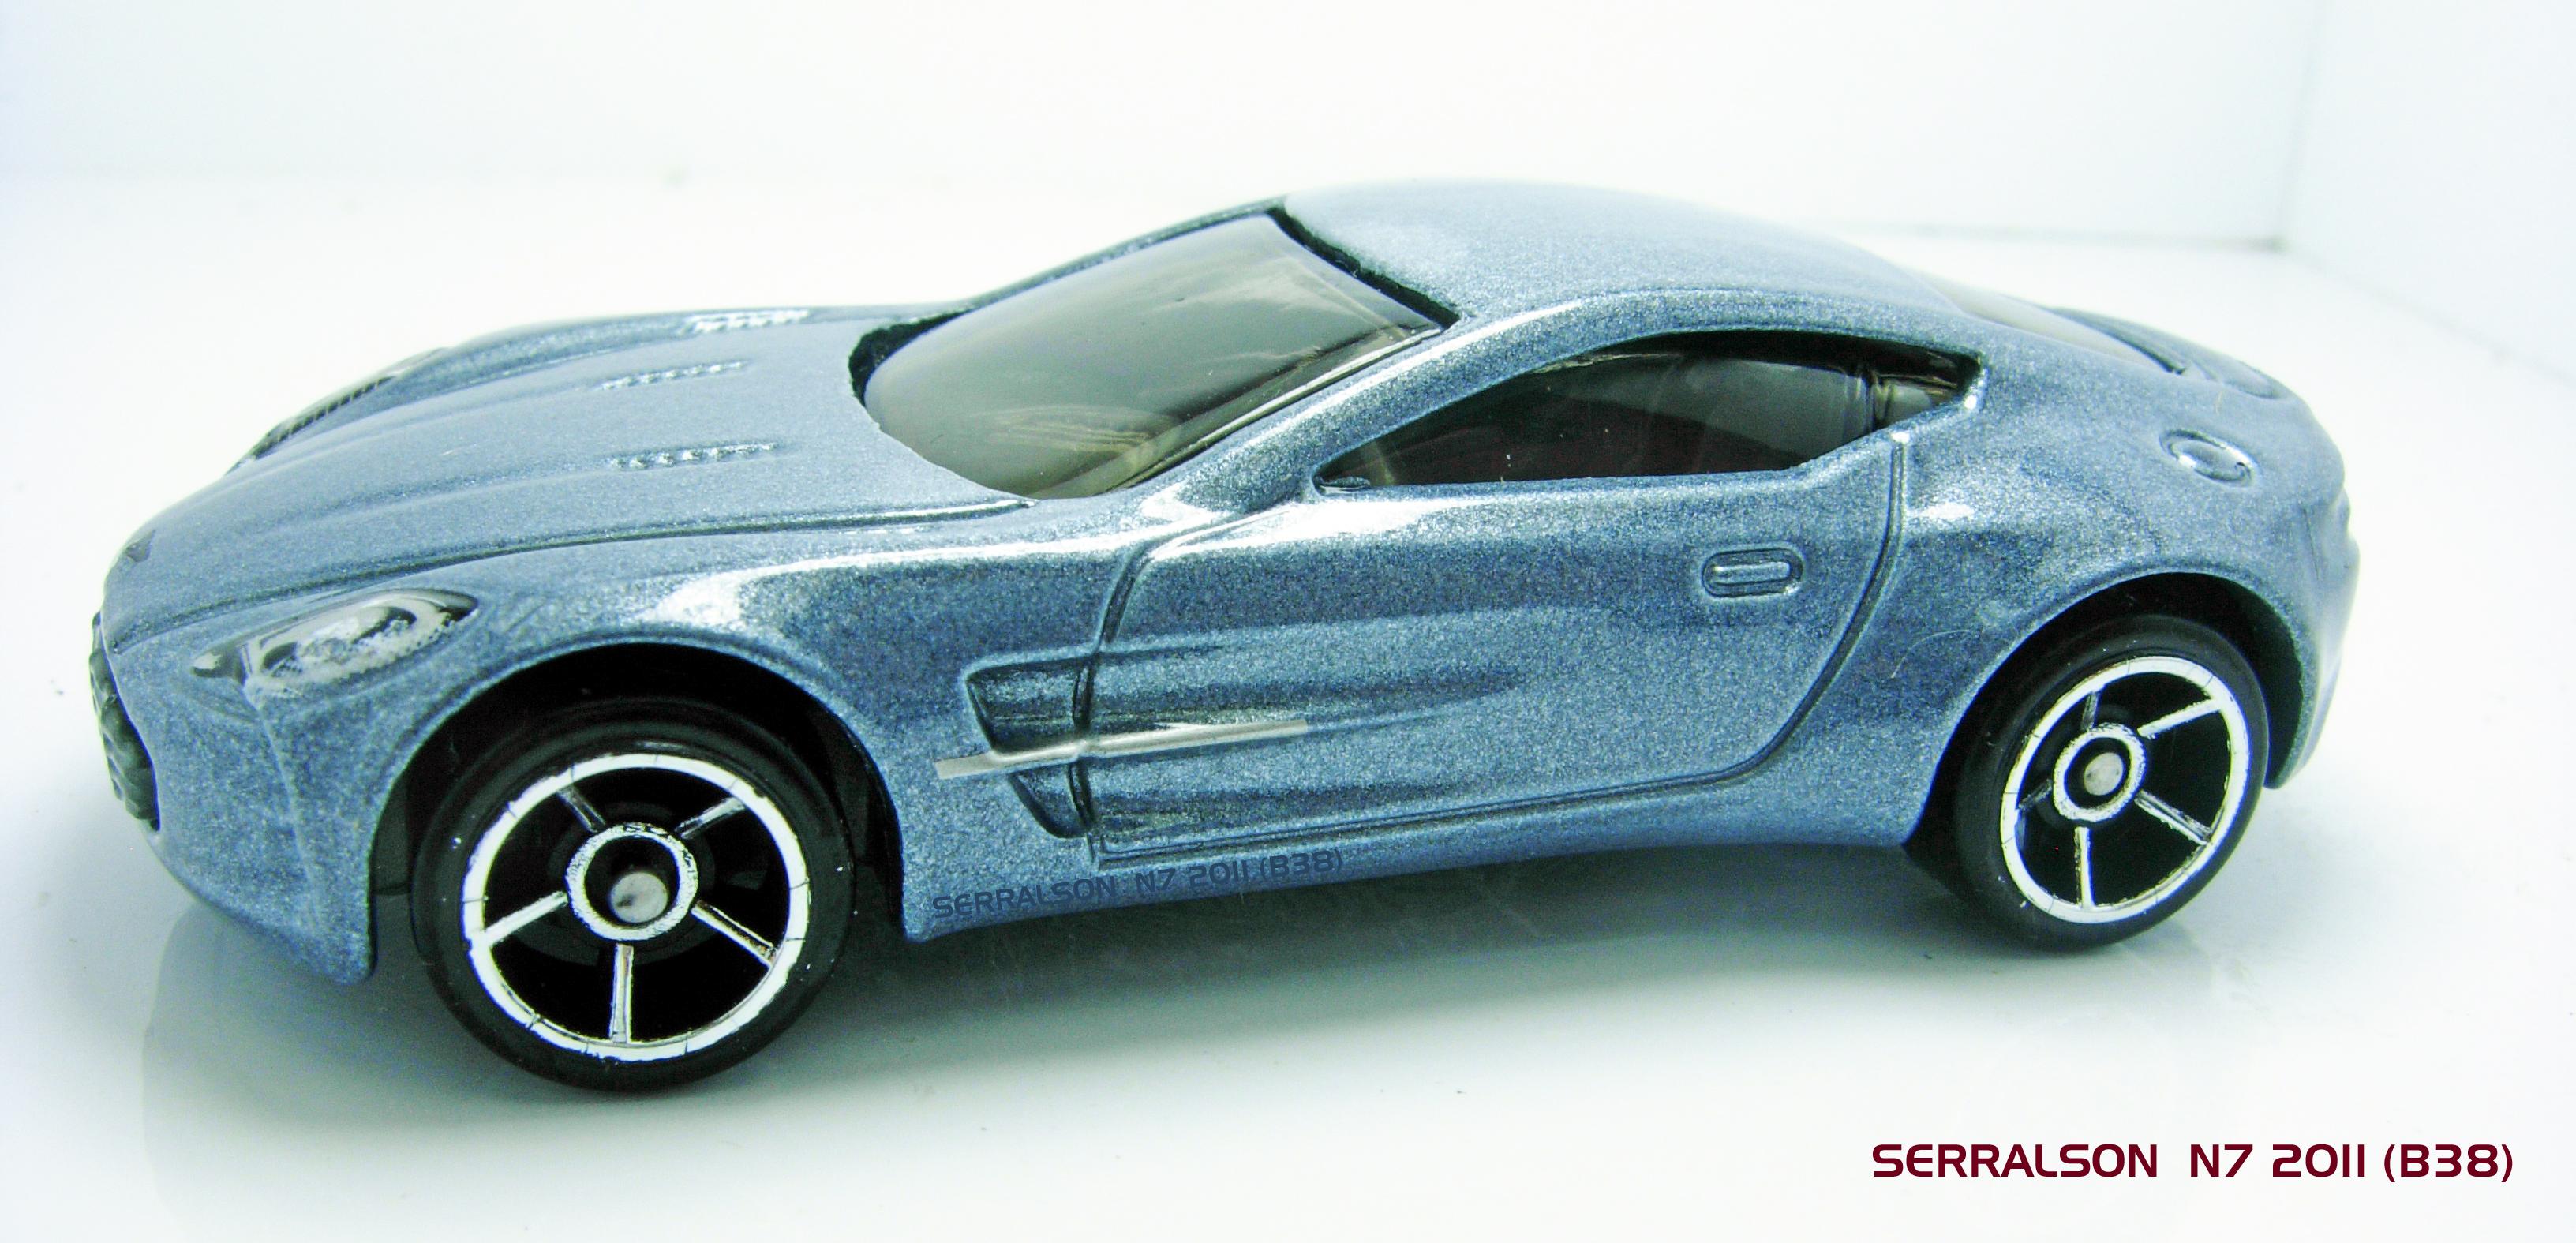 latest?cb=20110928234607 Surprising Lamborghini Gallardo Hot Wheels Wiki Cars Trend